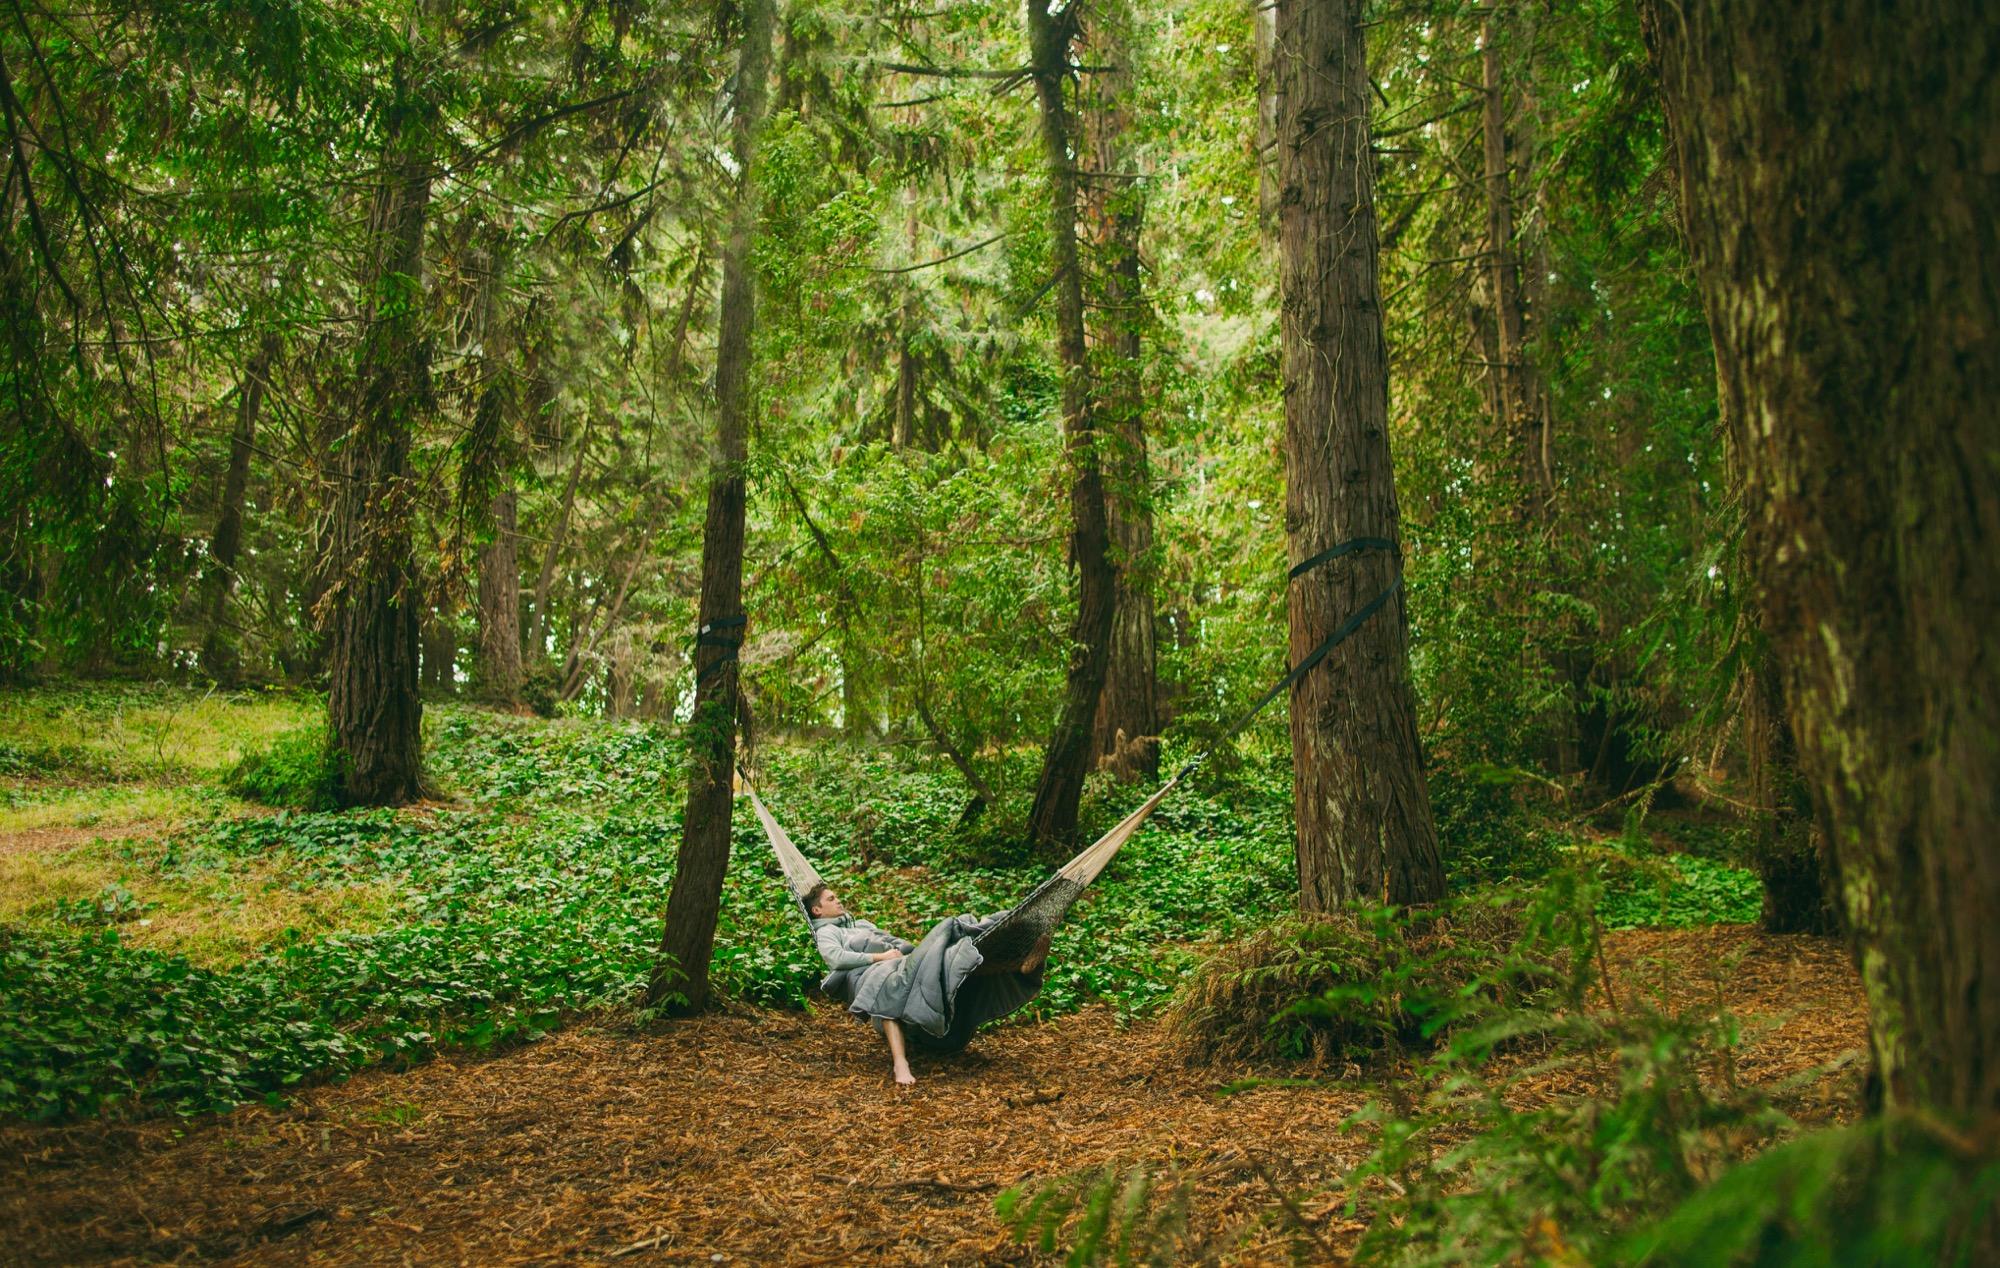 Rumpling in the woods / Photo by John Asuncion